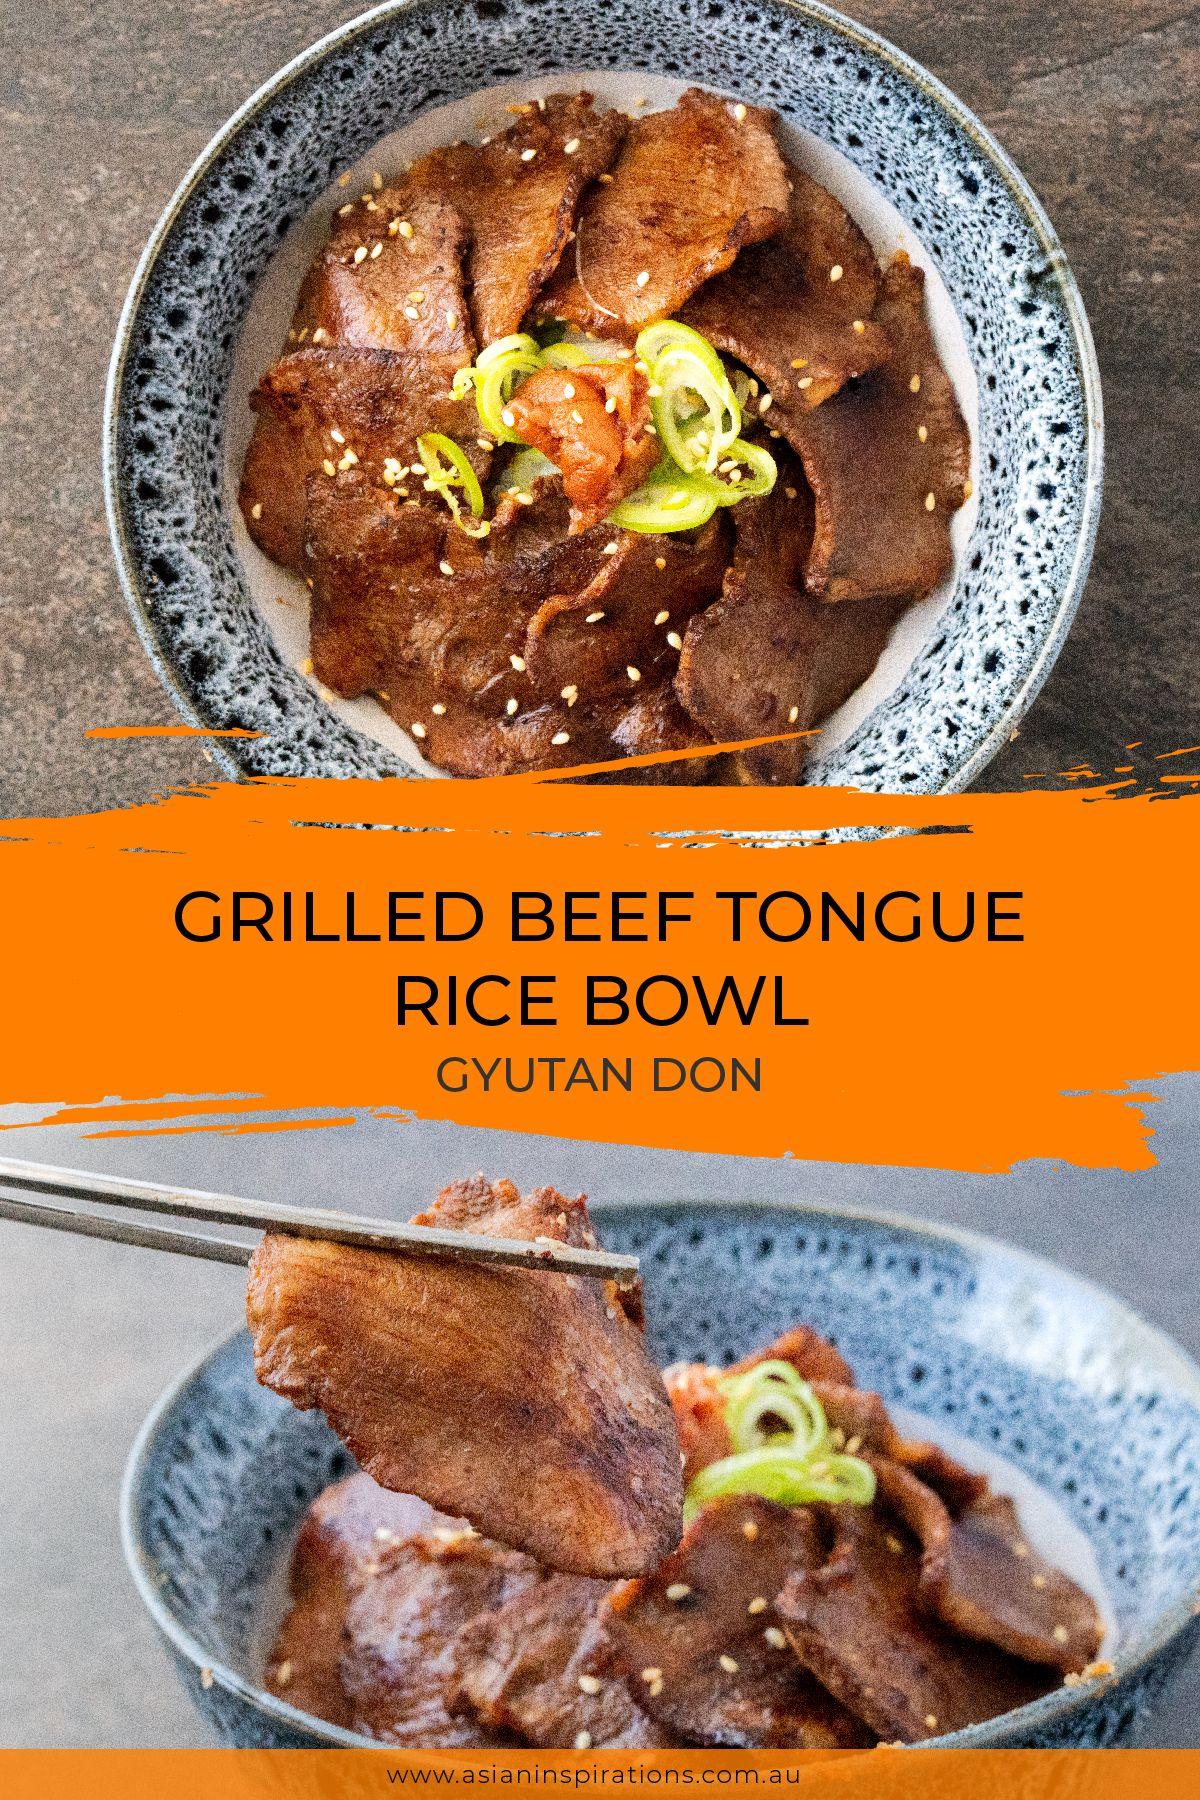 Grilled Beef Tongue Rice Bowl Gyutan Don Recipe Food Recipes